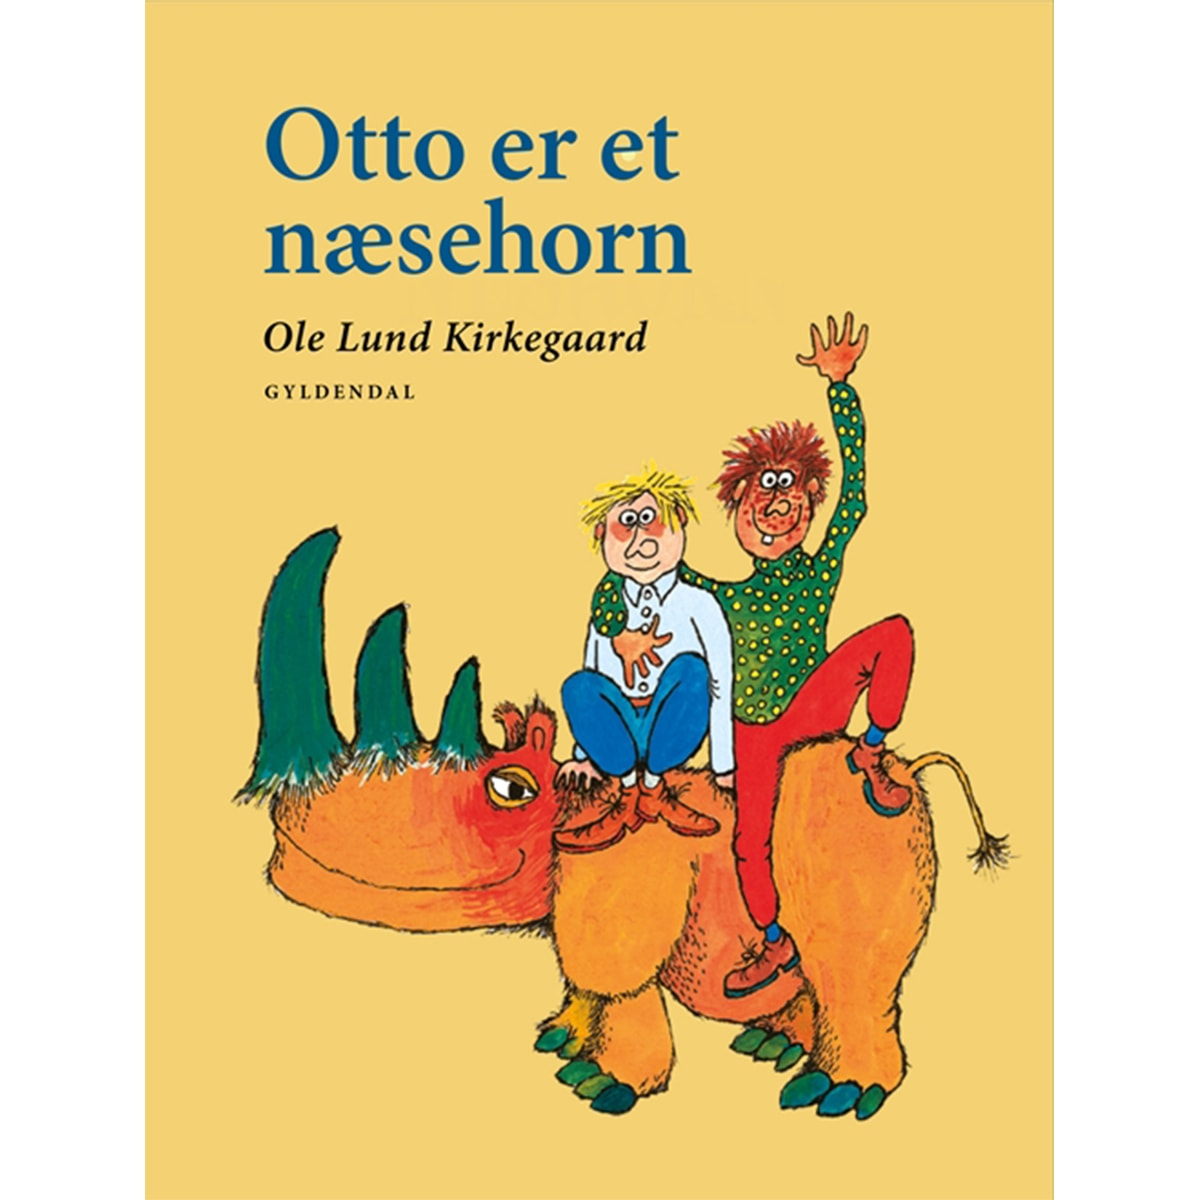 Af Ole Lund Kirkegaard